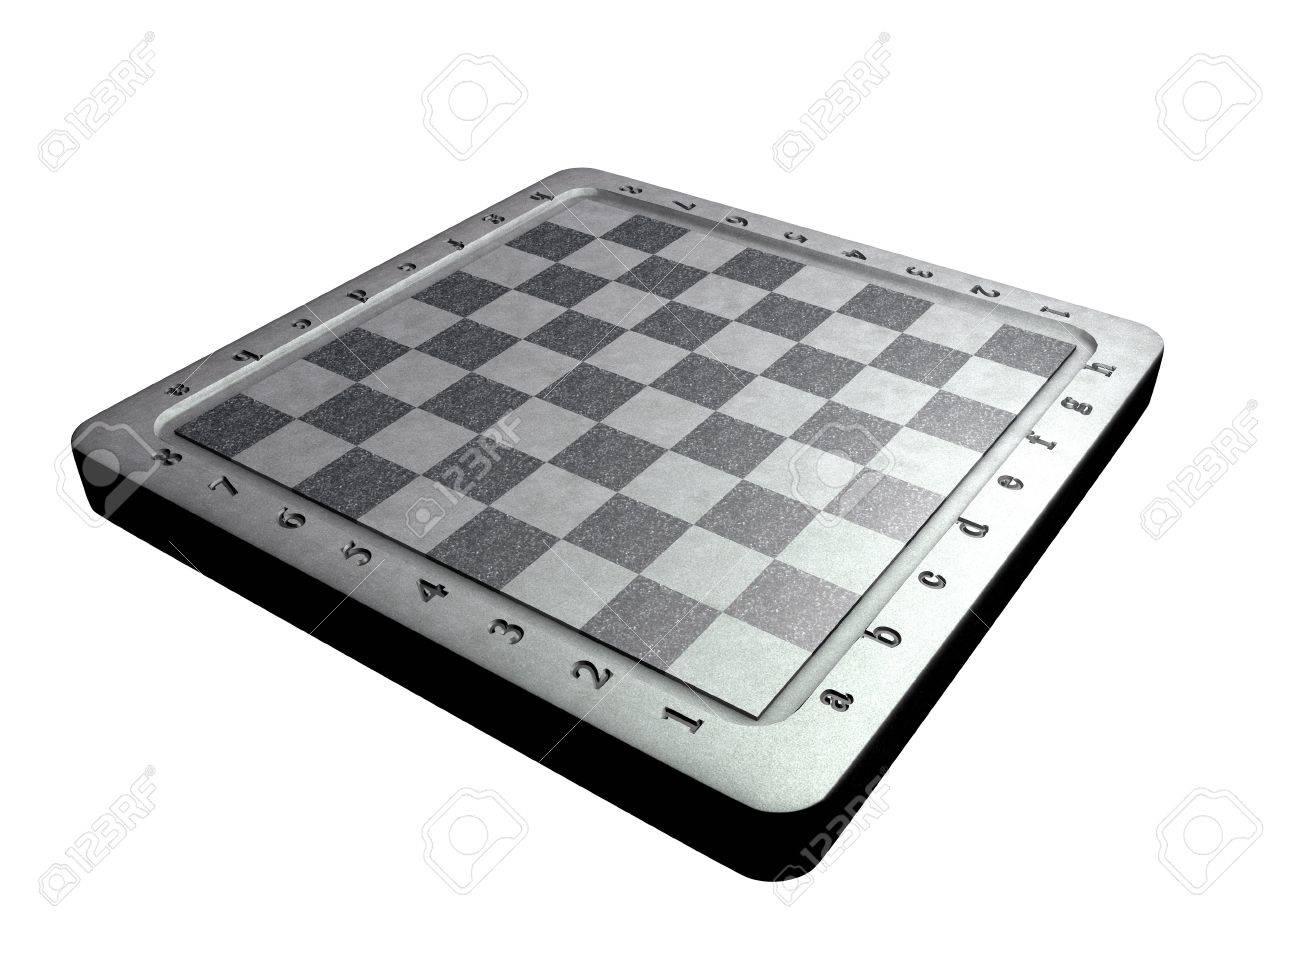 3D model of chessboard Stock Photo - 18001745